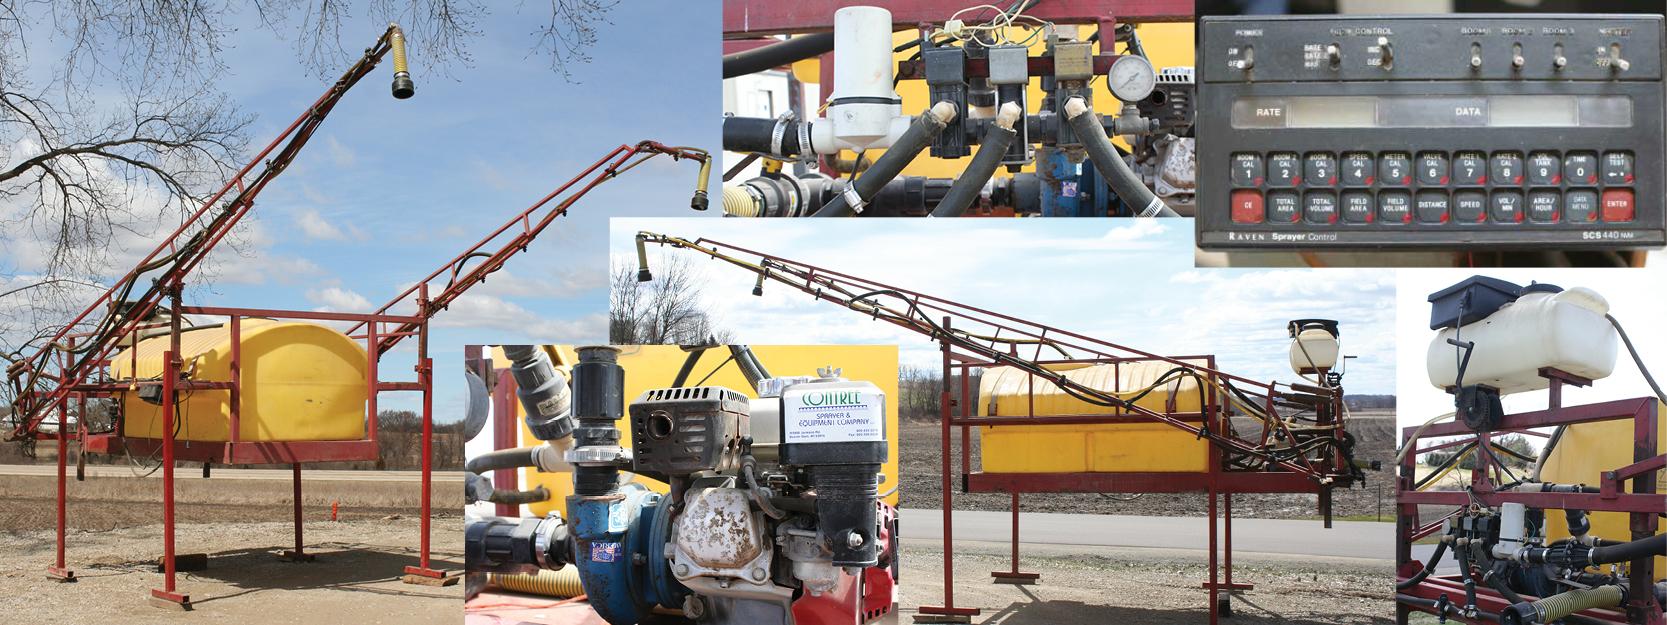 Contree Custom 500 Gallon Used Pickup Truck Sprayer Unit